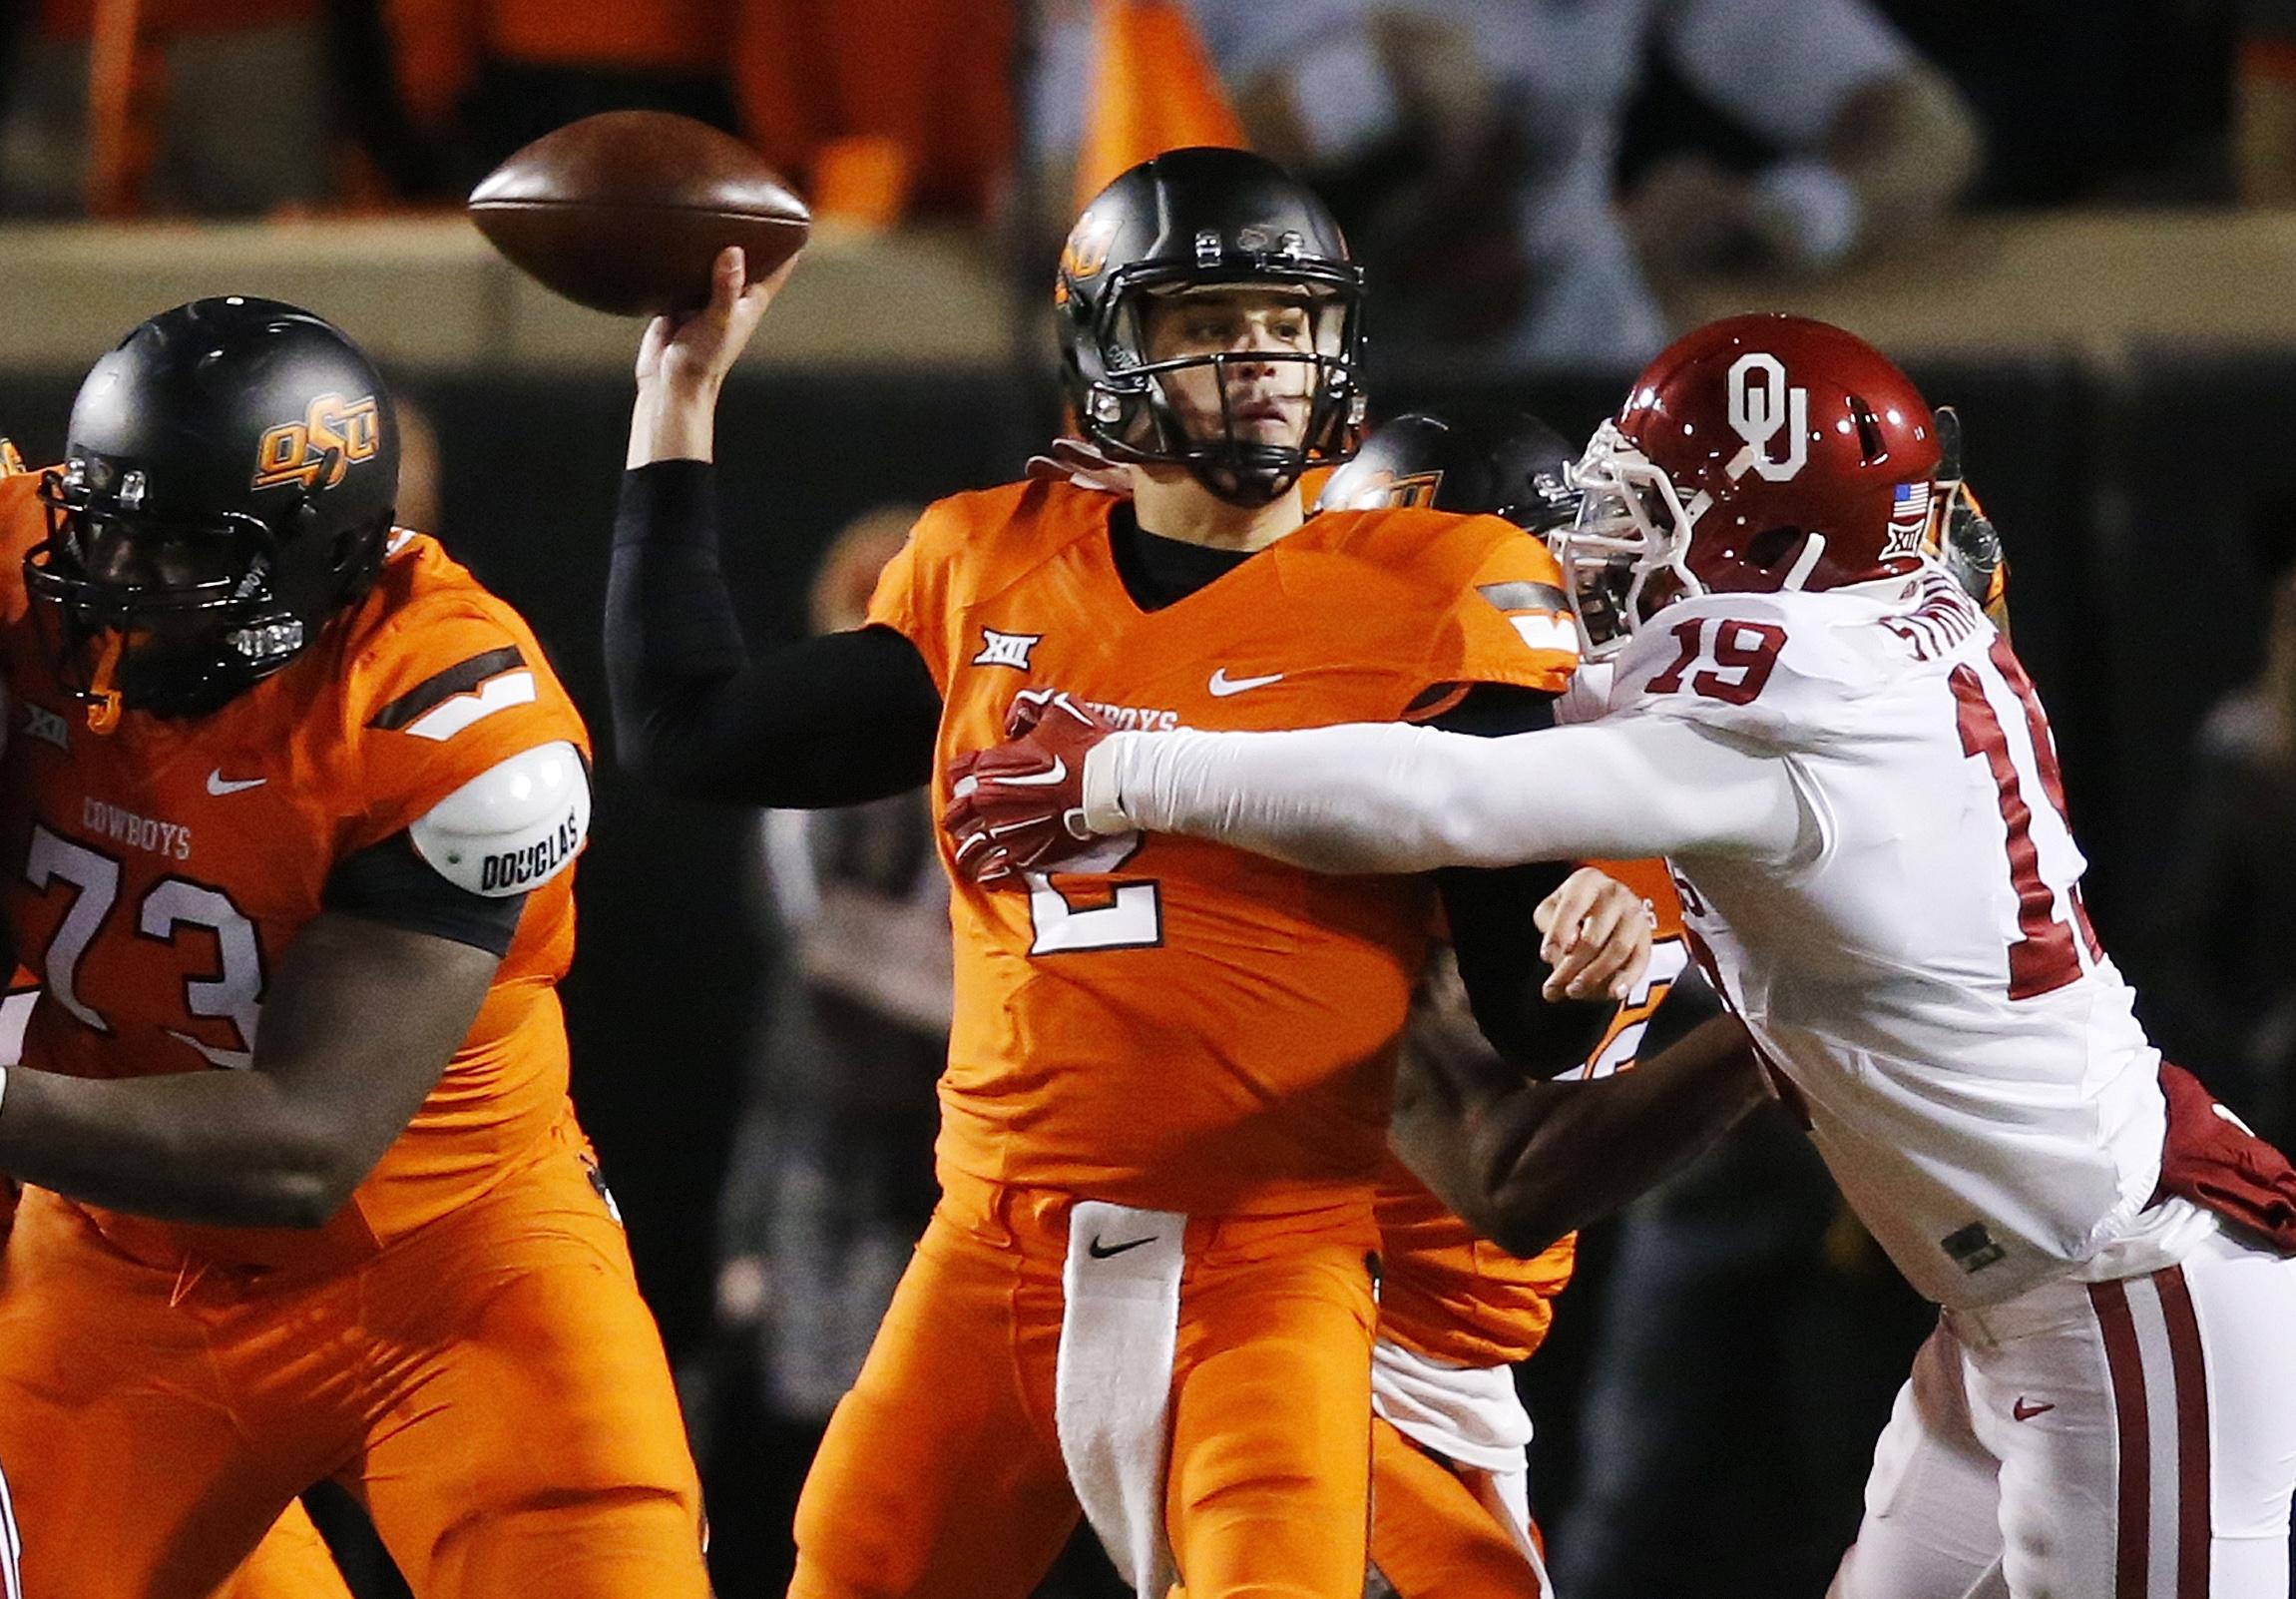 Oklahoma State quarterback Mason Rudolph (2) throws an interception under pressure from Oklahoma linebacker Eric Striker (19) in the second quarter of an NCAA college football game in Stillwater, Okla., Saturday, Nov. 28, 2015. (AP Photo/Sue Ogrocki)